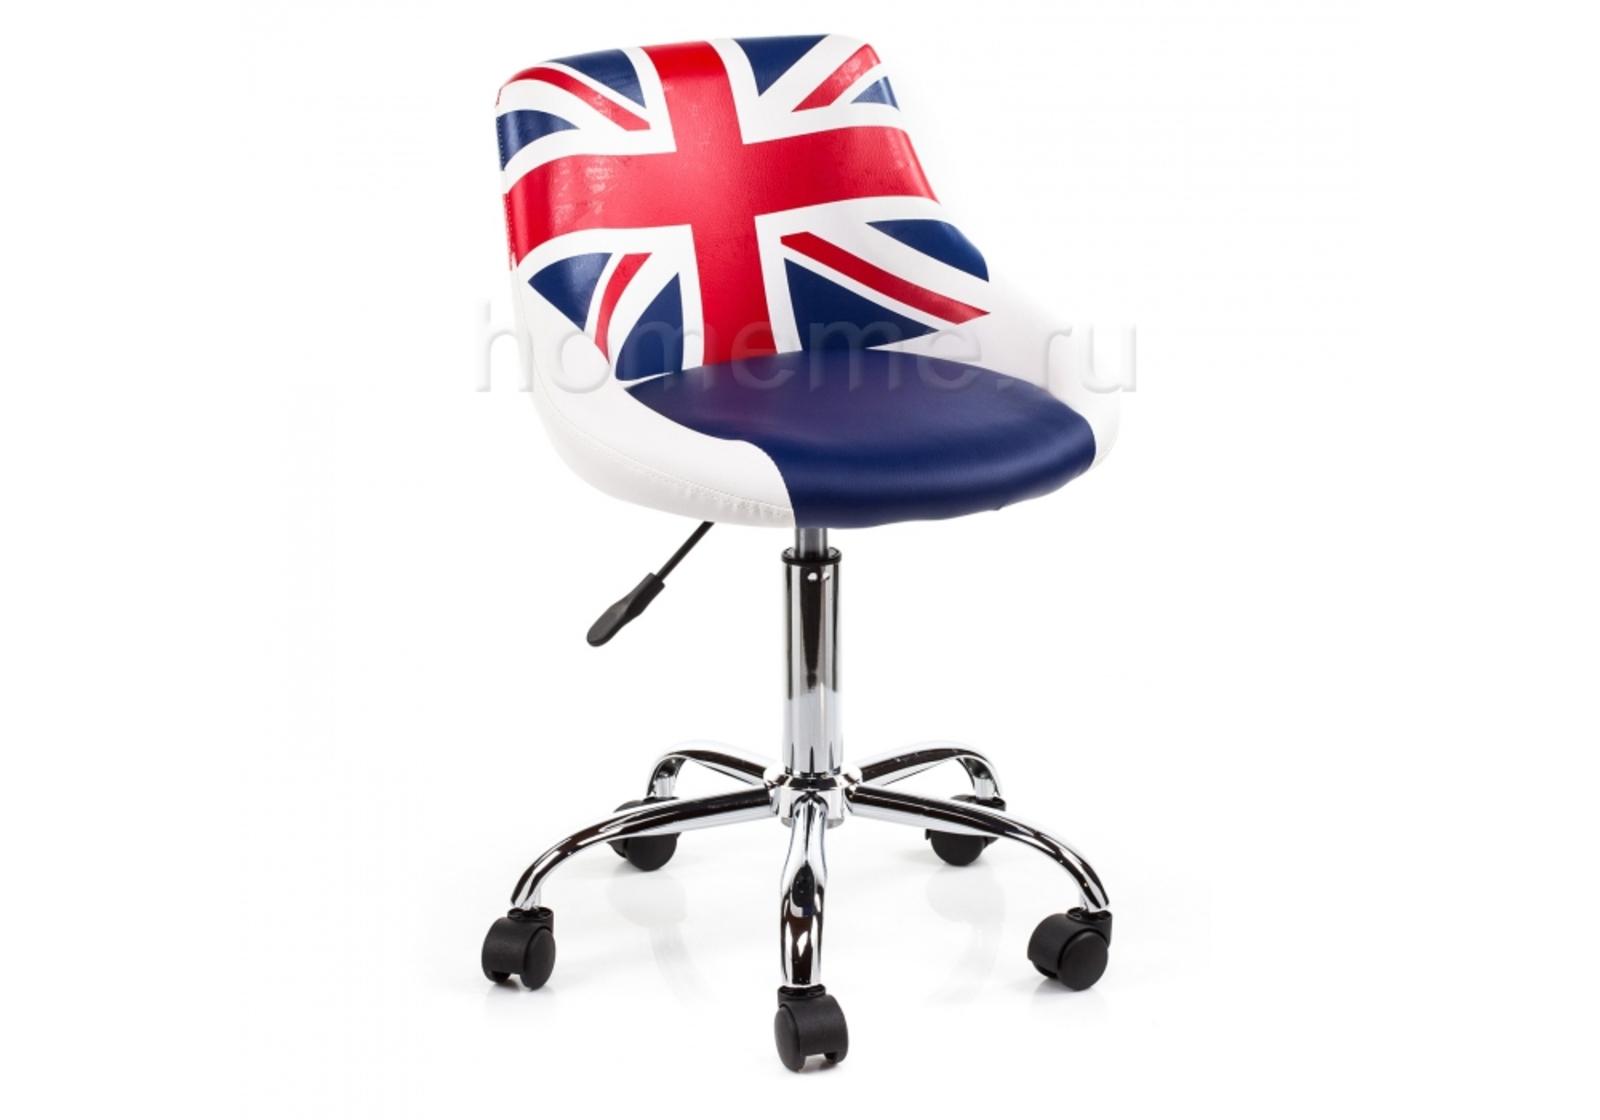 Кресло для офиса HomeMe Flag 1558 от Homeme.ru